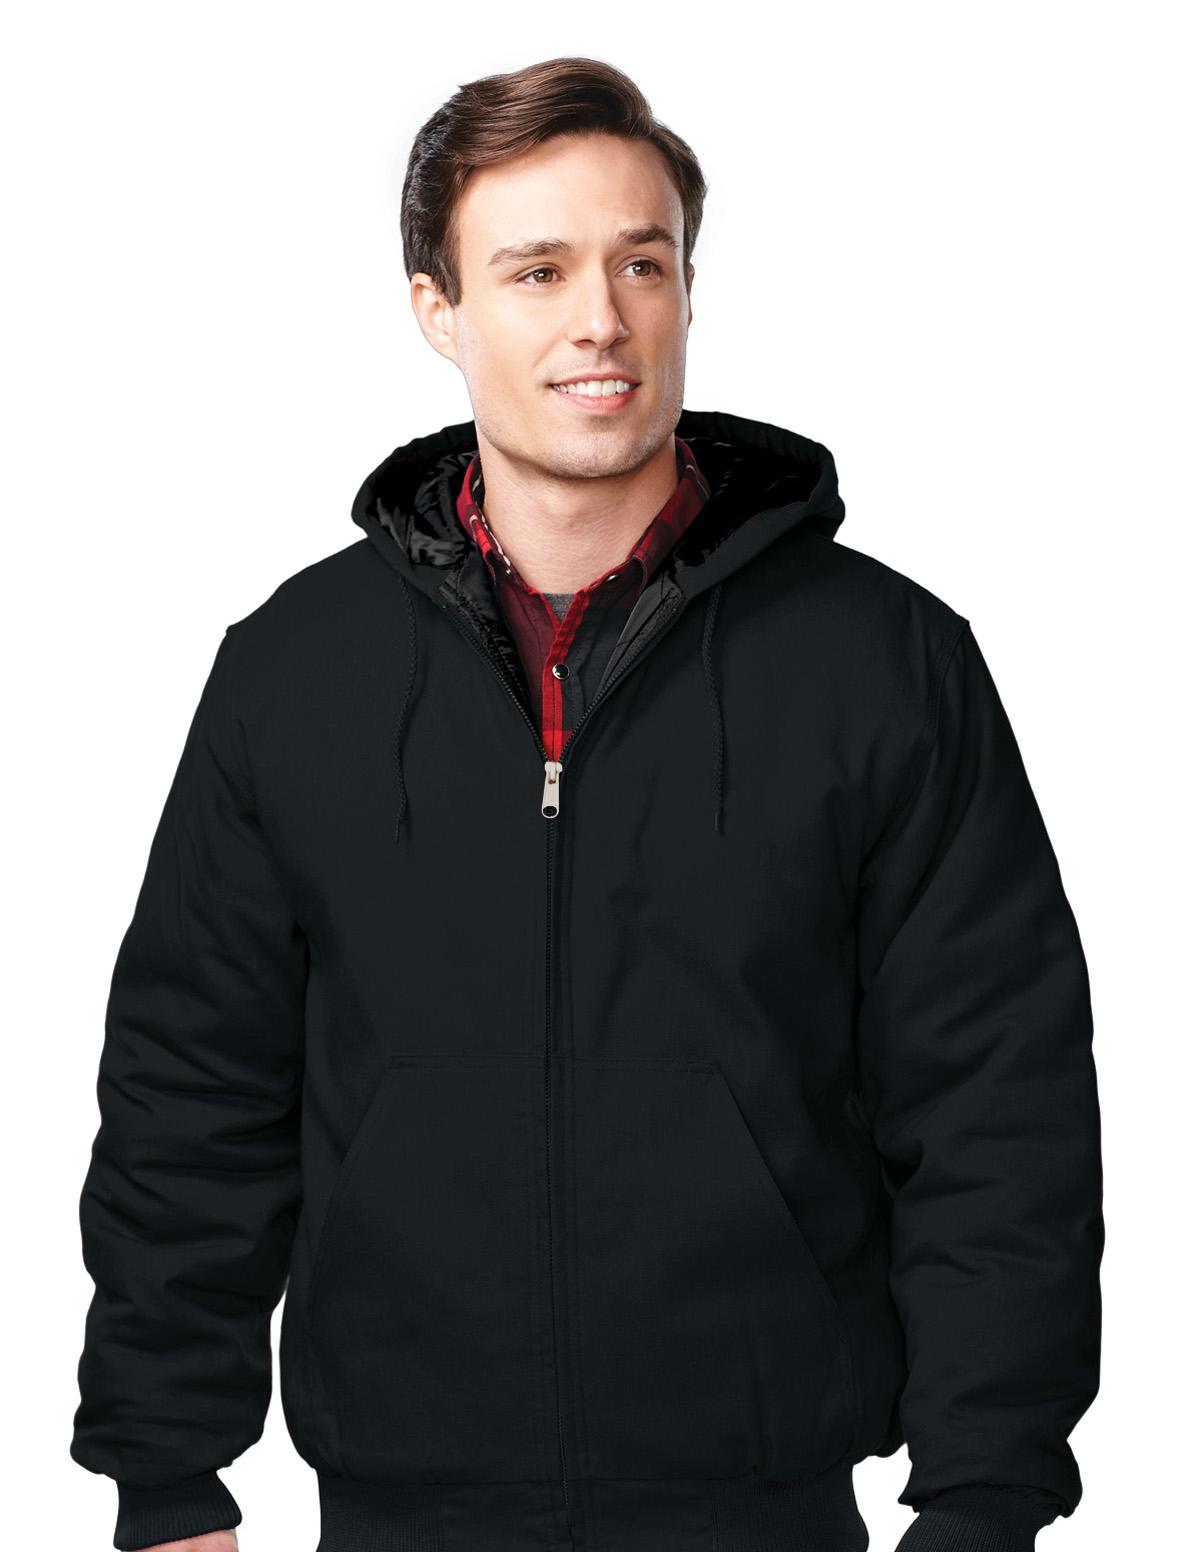 Tri-Mountain Foreman J4550 Cotton Canvas Hooded Jacket, 2X-Large, Black